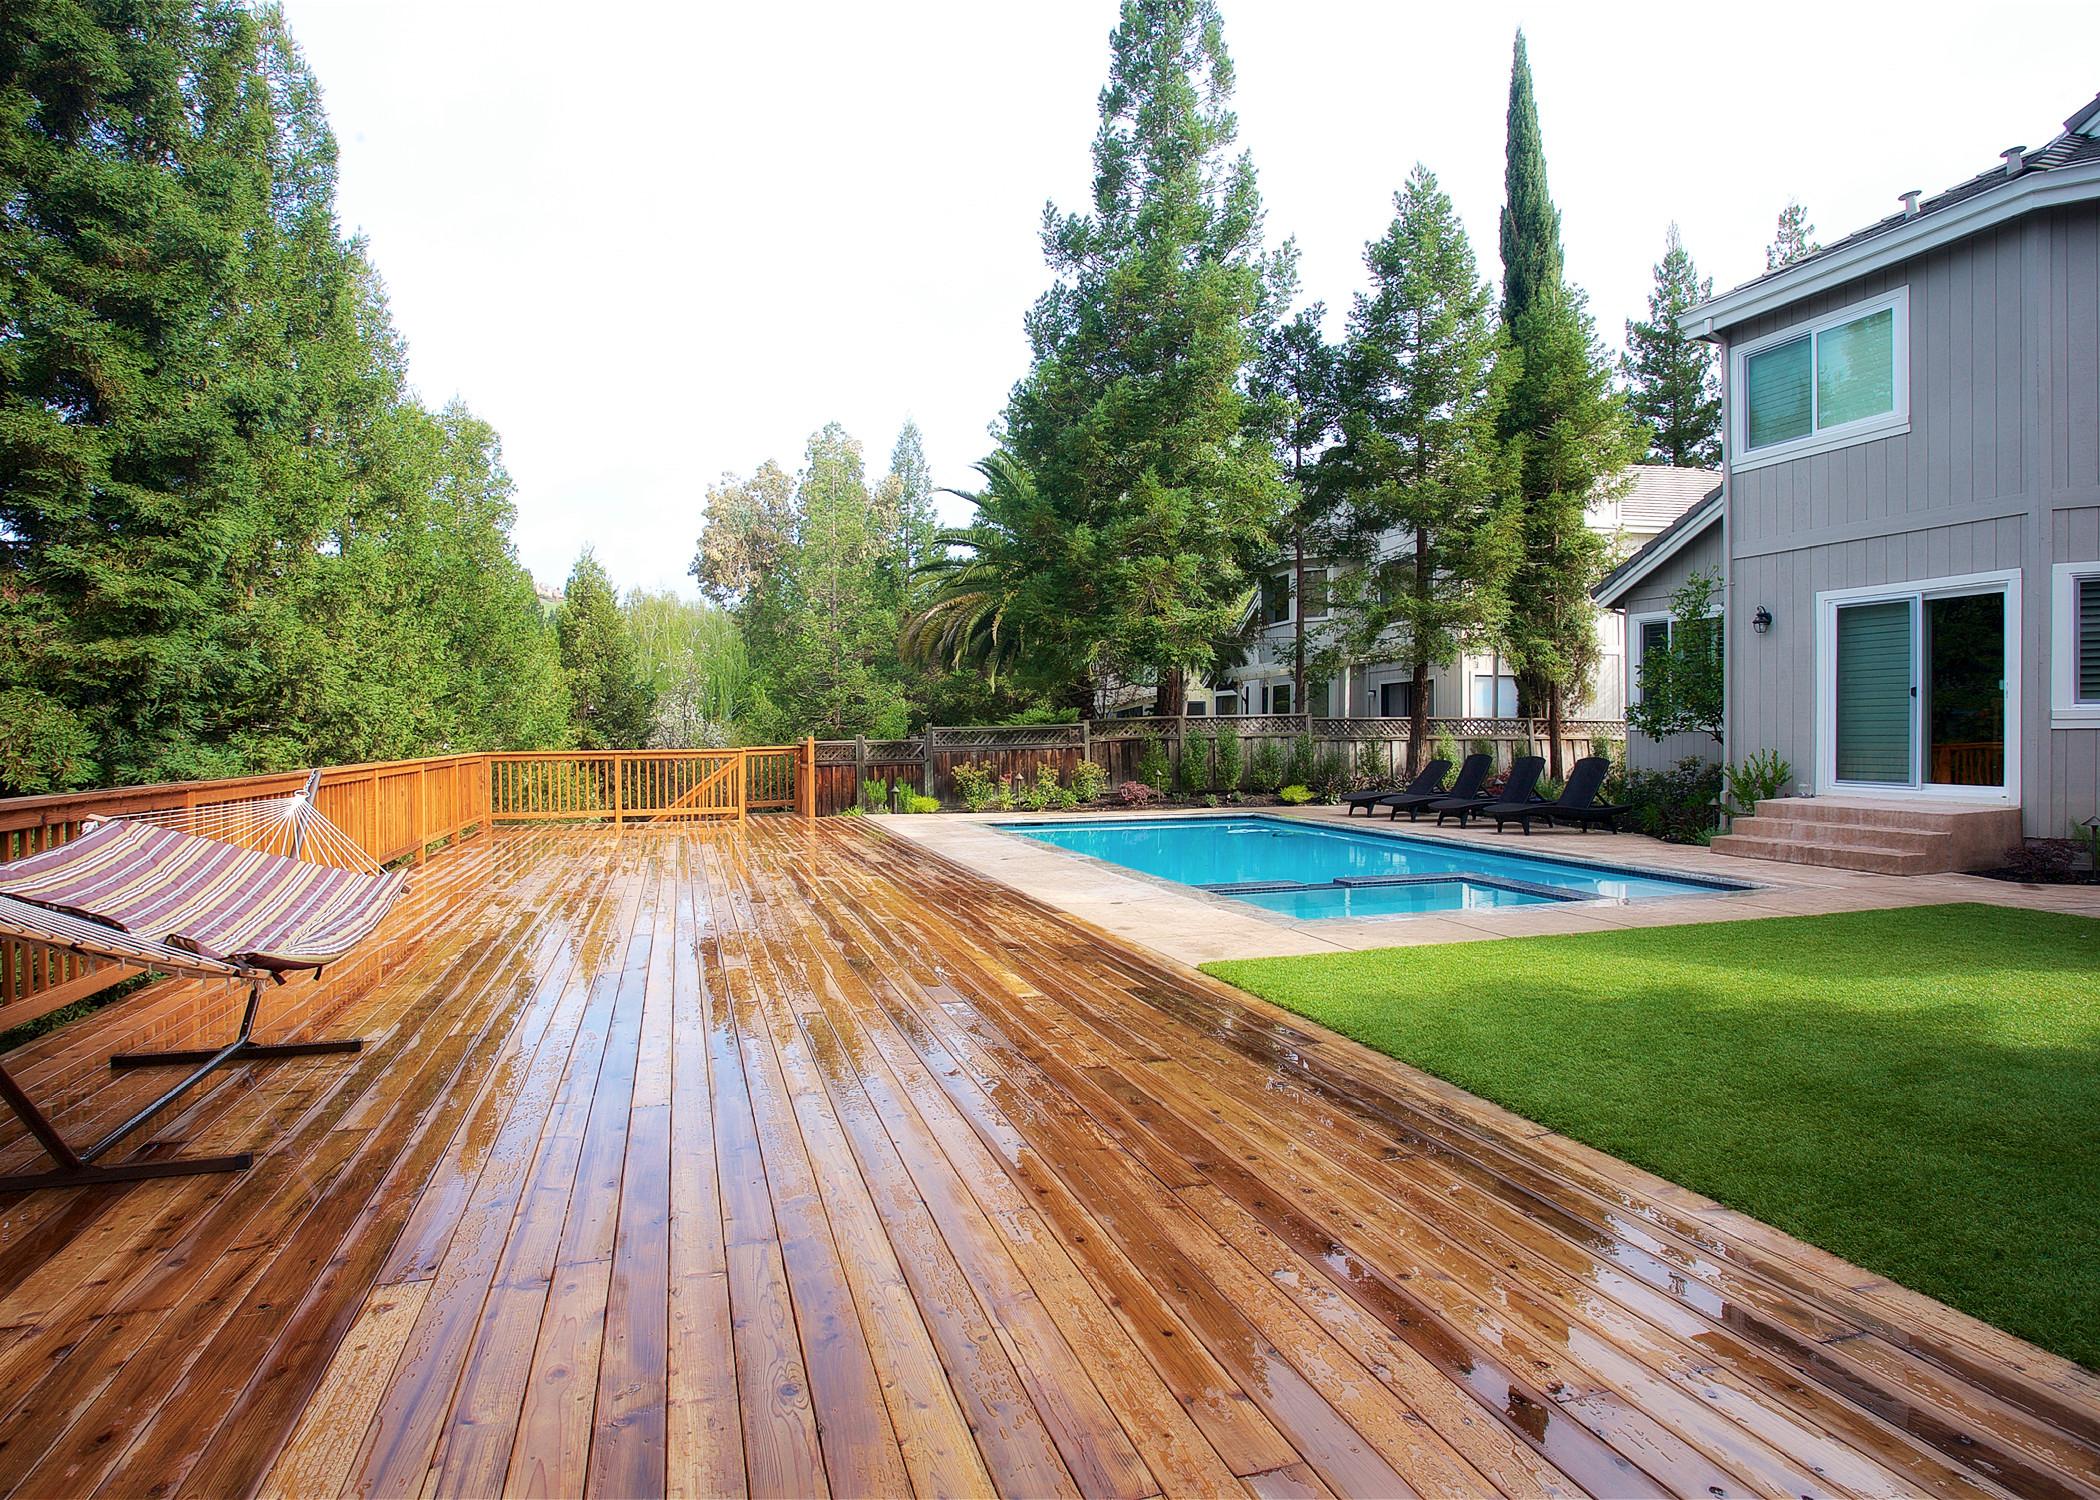 Pool, Deck & BBQ